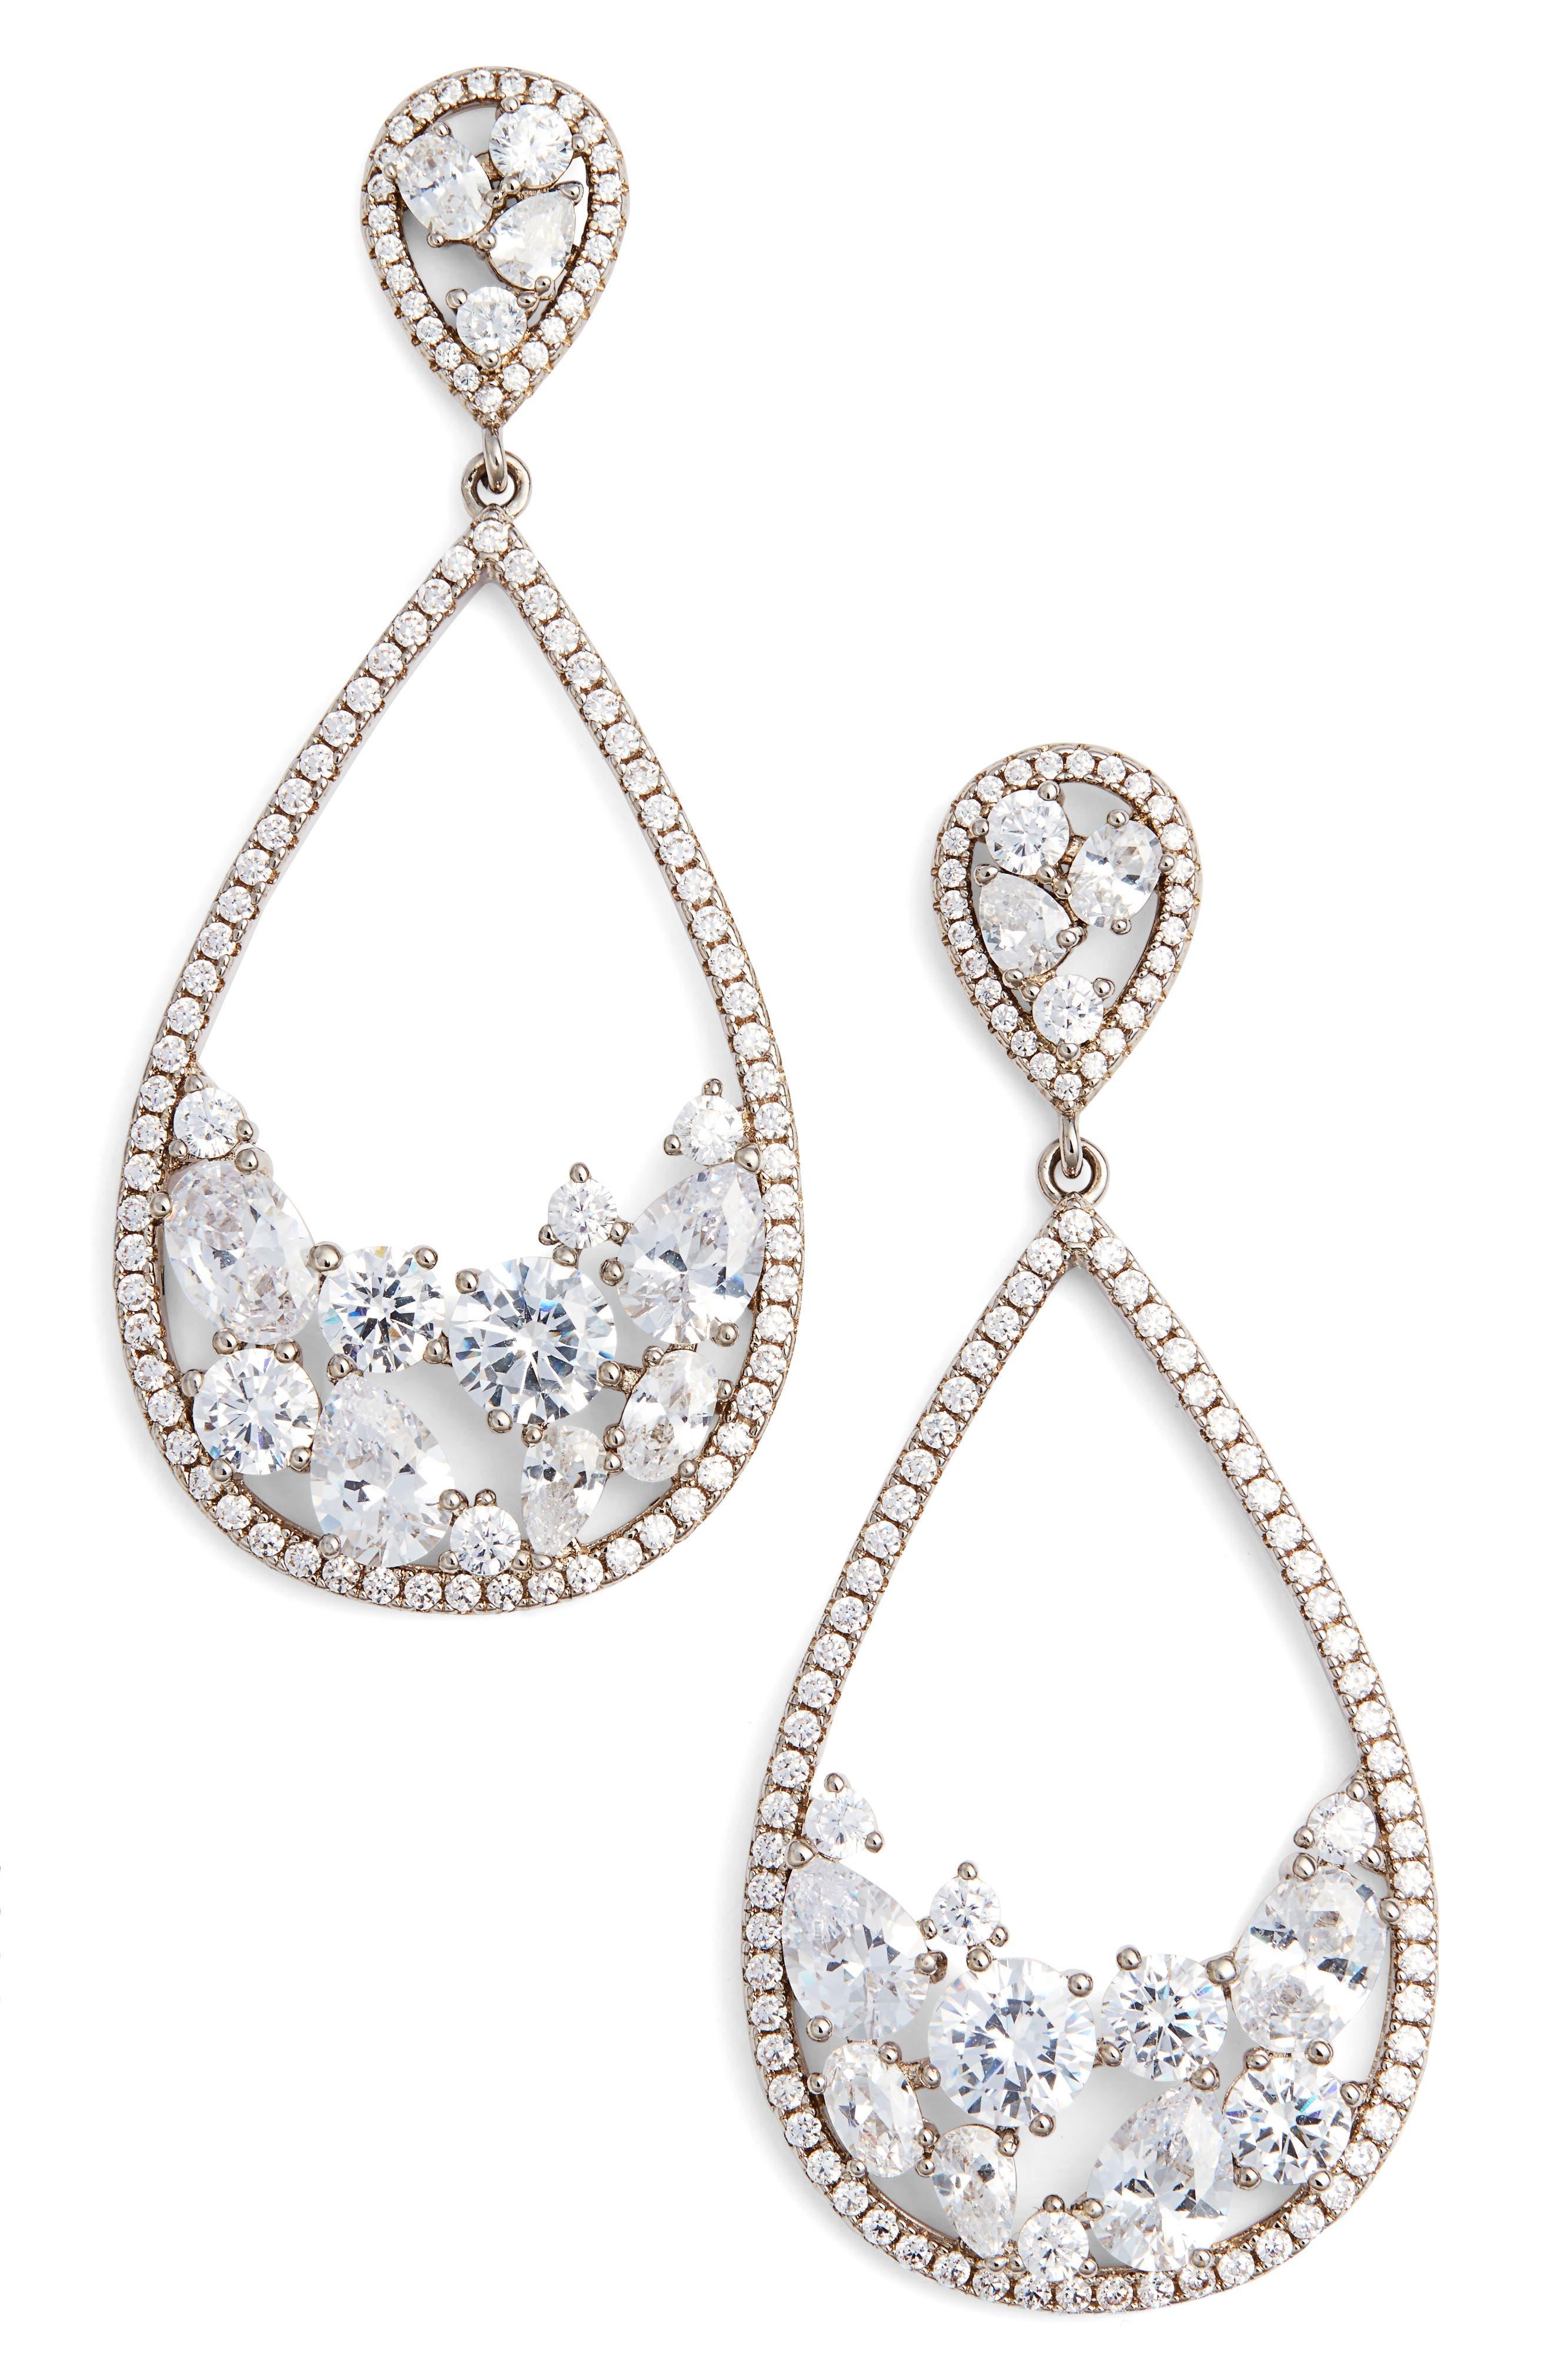 Stone Cluster Open Teardrop Earrings,                             Main thumbnail 1, color,                             SILVER/ WHITE CZ